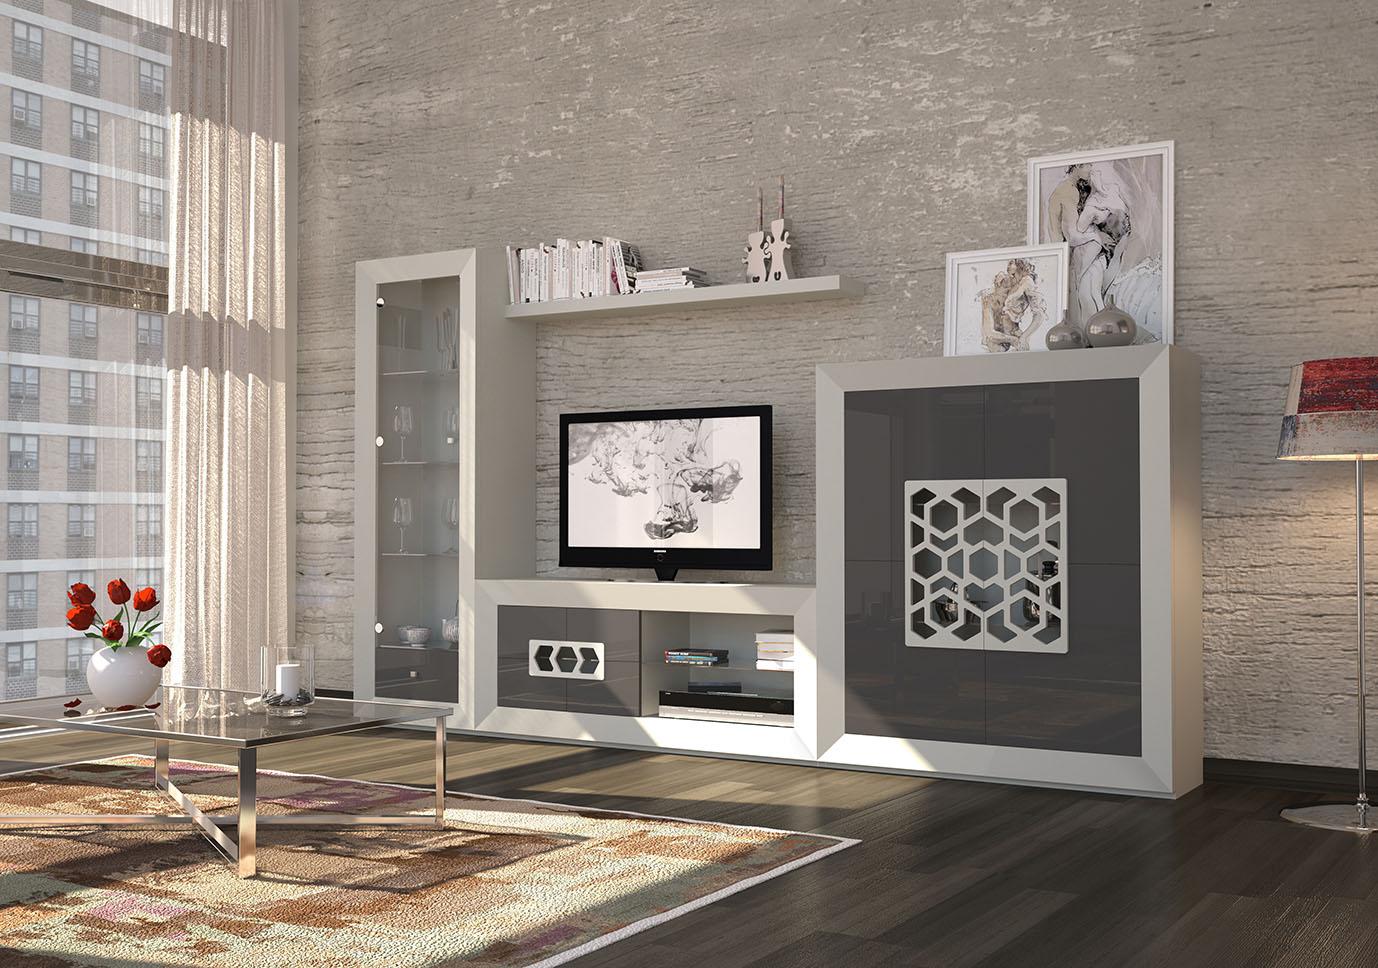 salon-contemporaneo-Basik-muebles-paco-caballero-1231-5c93923f135d6